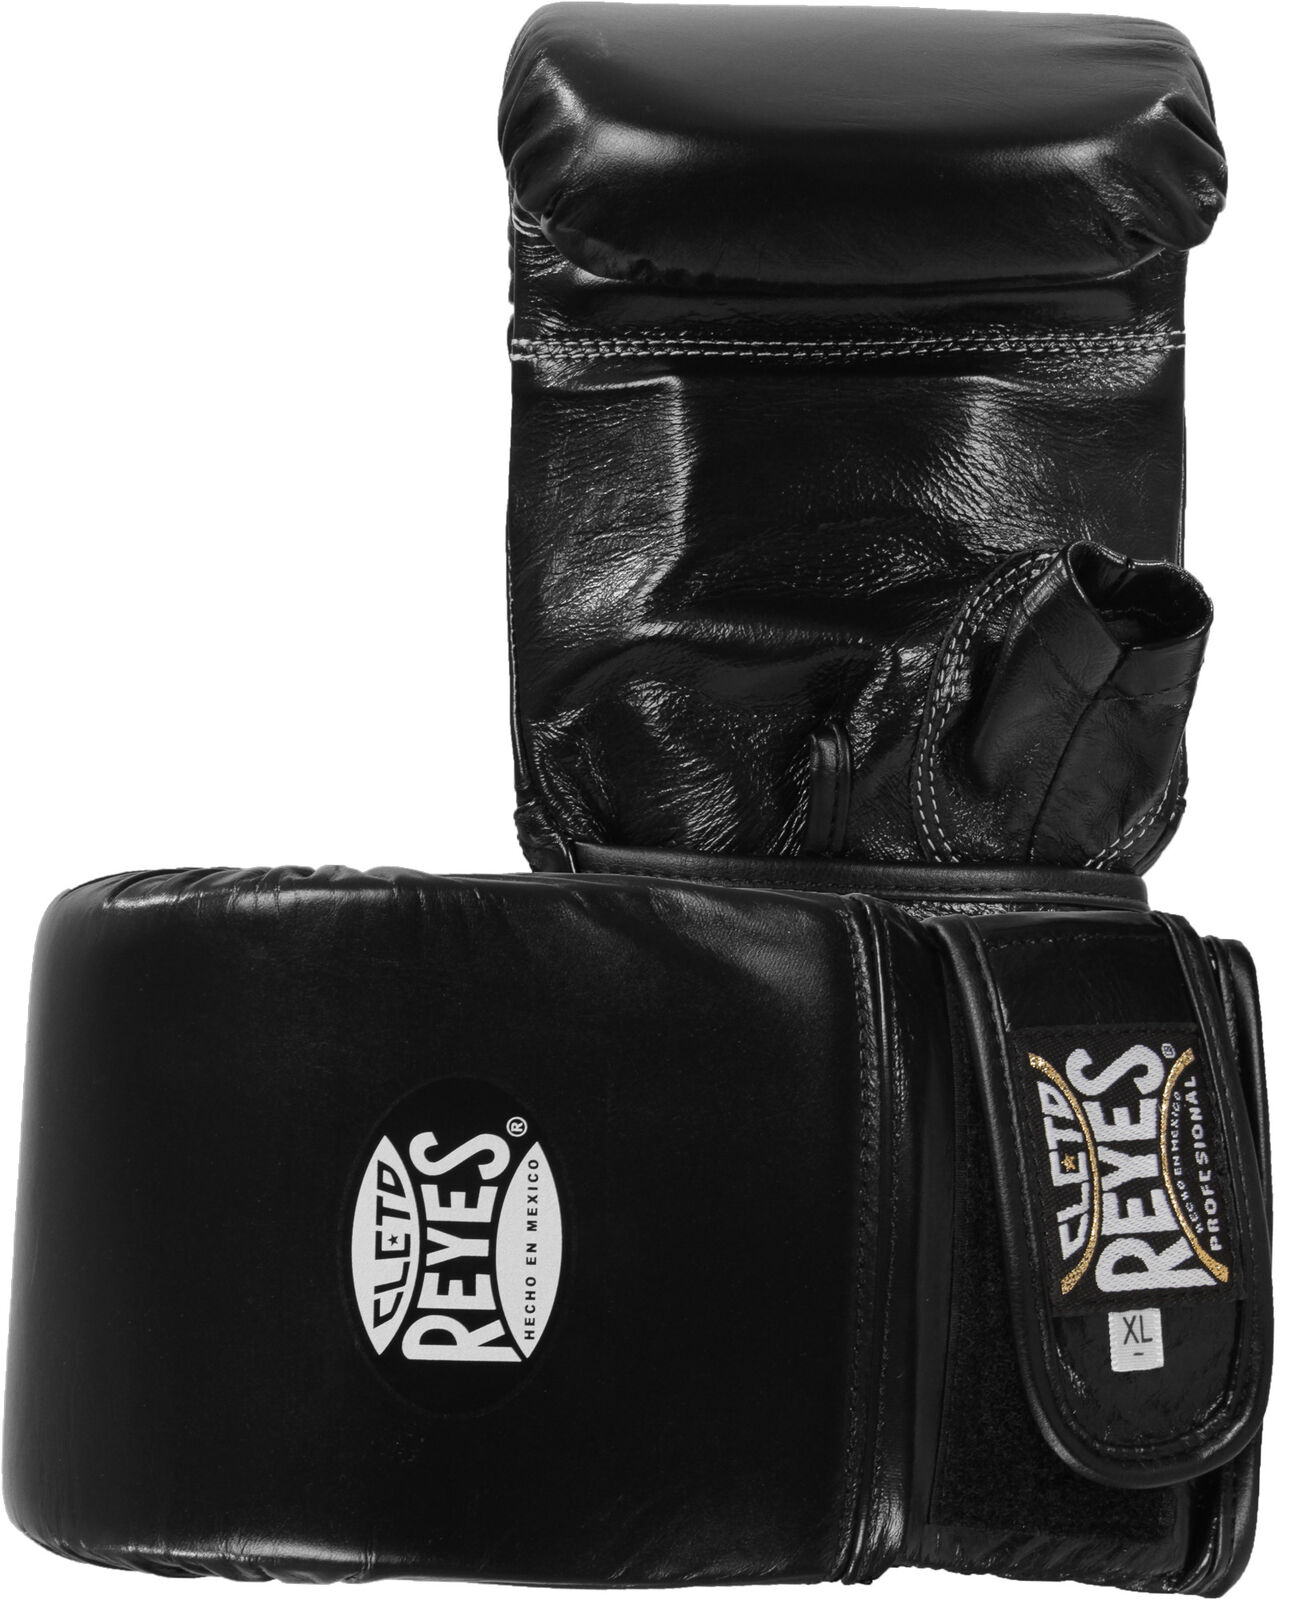 Cleto Klett Reyes Klett Cleto Leder Boxen Tasche Handschuhe - Schwarz 1bb4a1